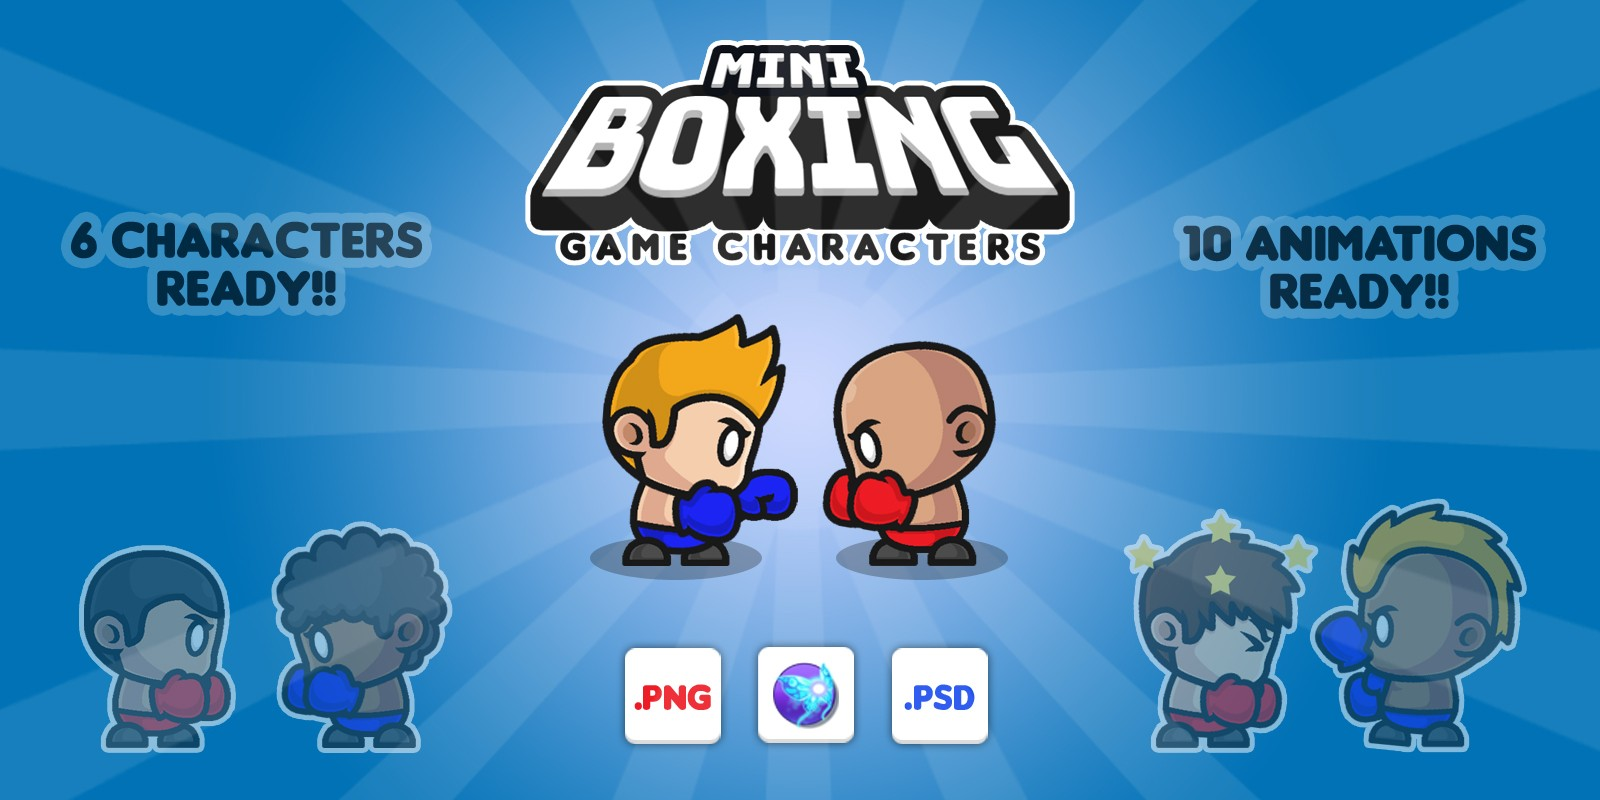 Mini Boxing - Game Characters